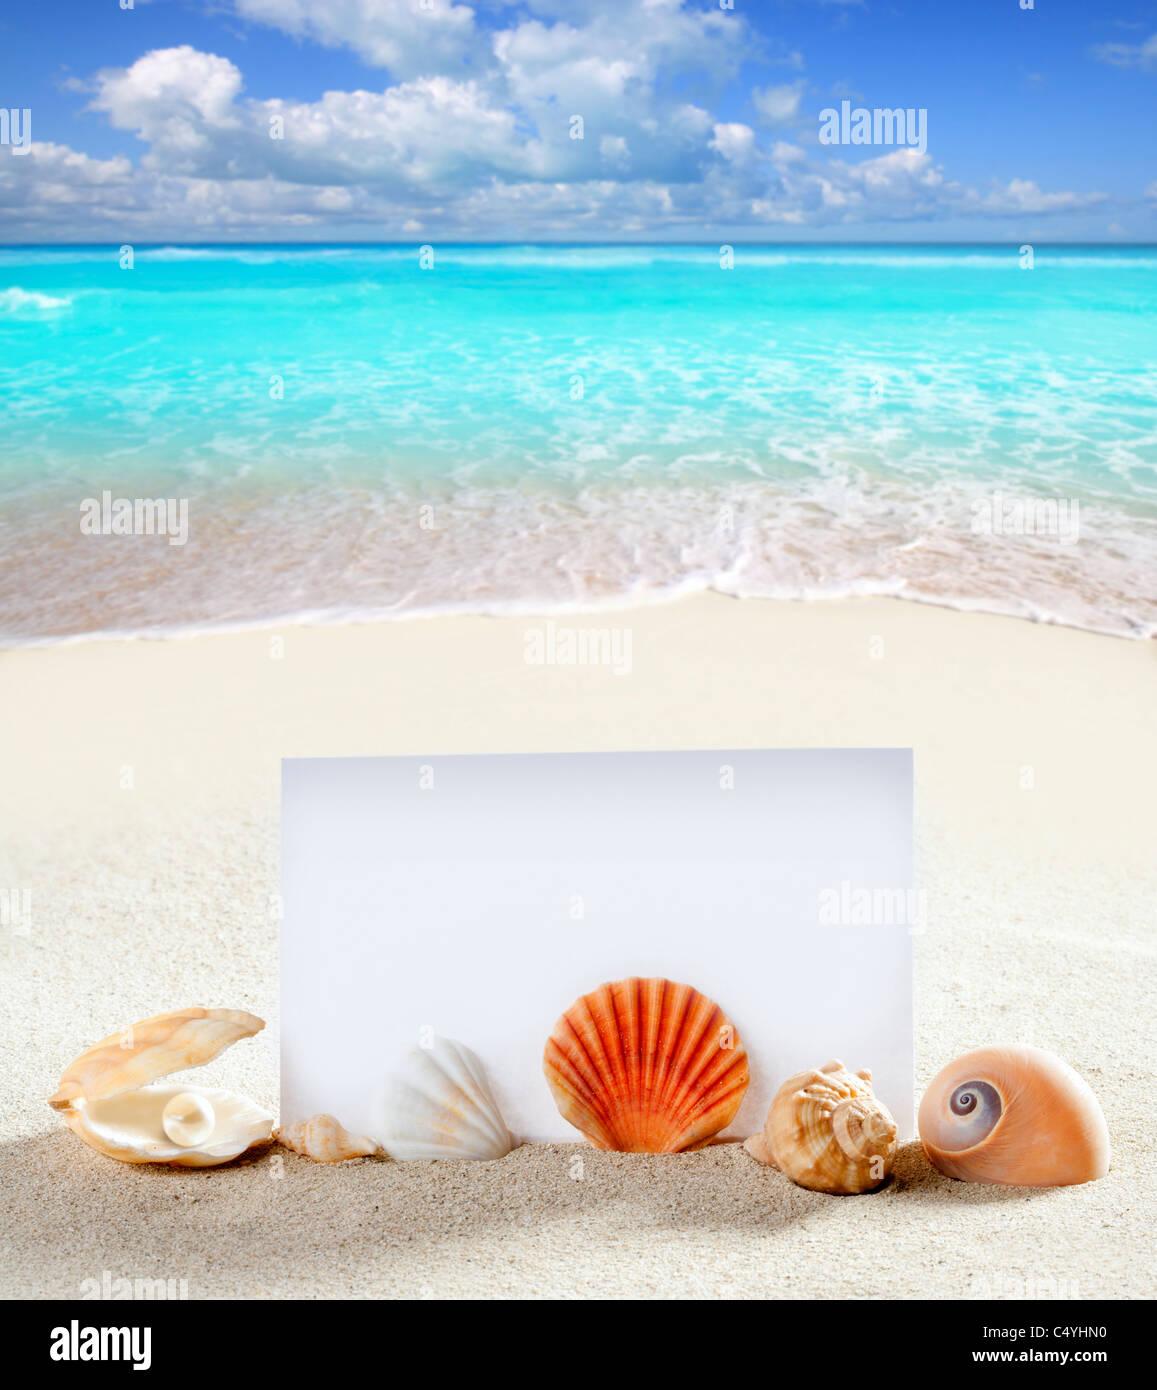 Vacation at the beach essay